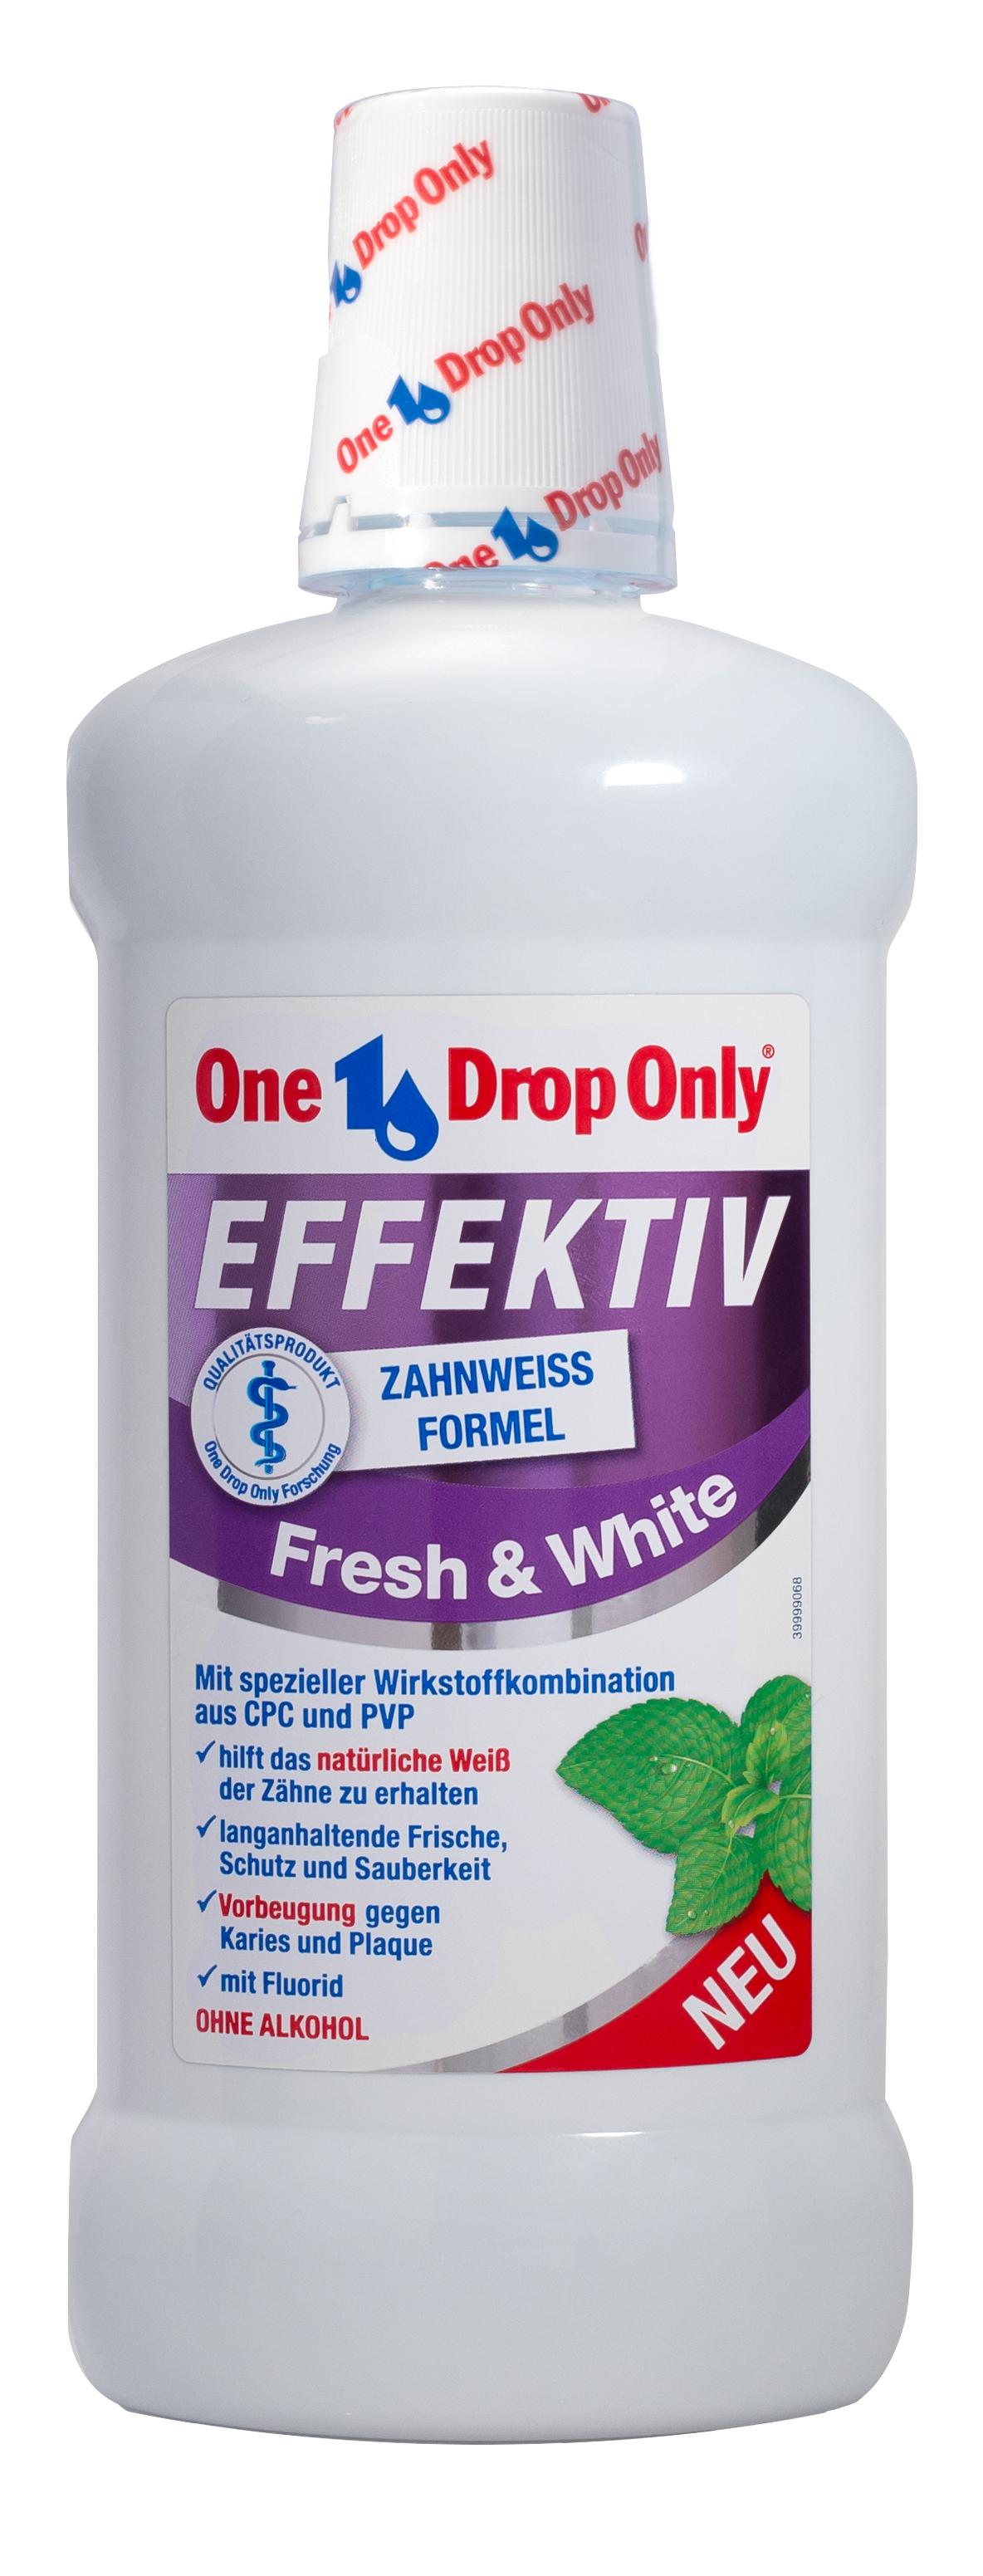 One Drop Only Effektiv Fresh&White Антибактериальный ополаскиватель полости рта, 500 мл20000Отбеливающий и освежающий ополаскиватель полости рта